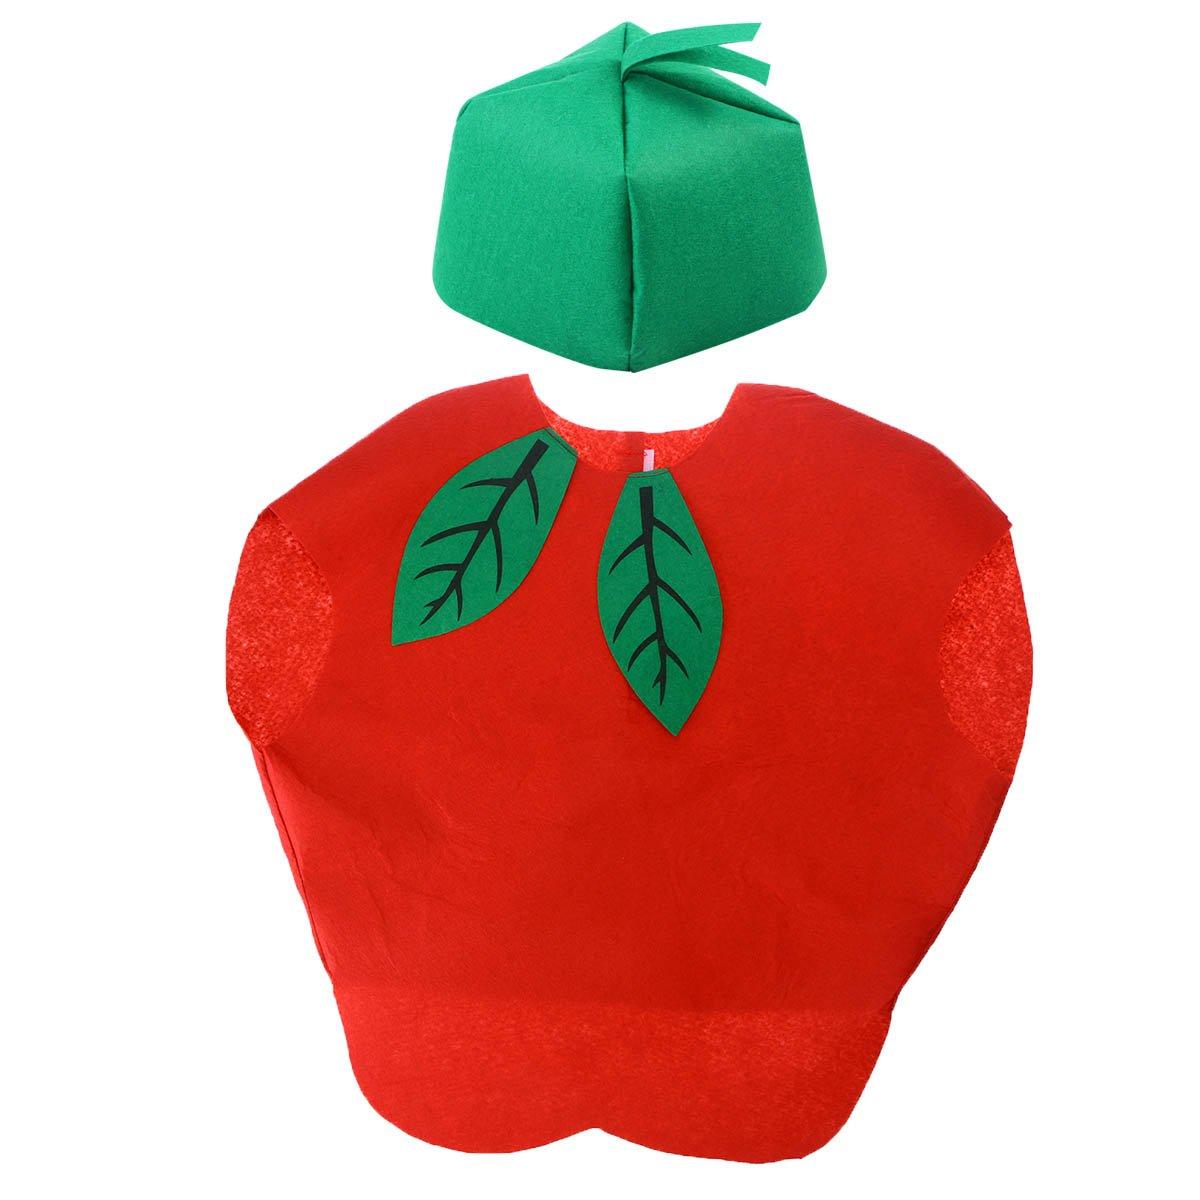 BESTOYARD Kinder Obst Gemüse Kostüm Kinder Apple Party Kleidung ...